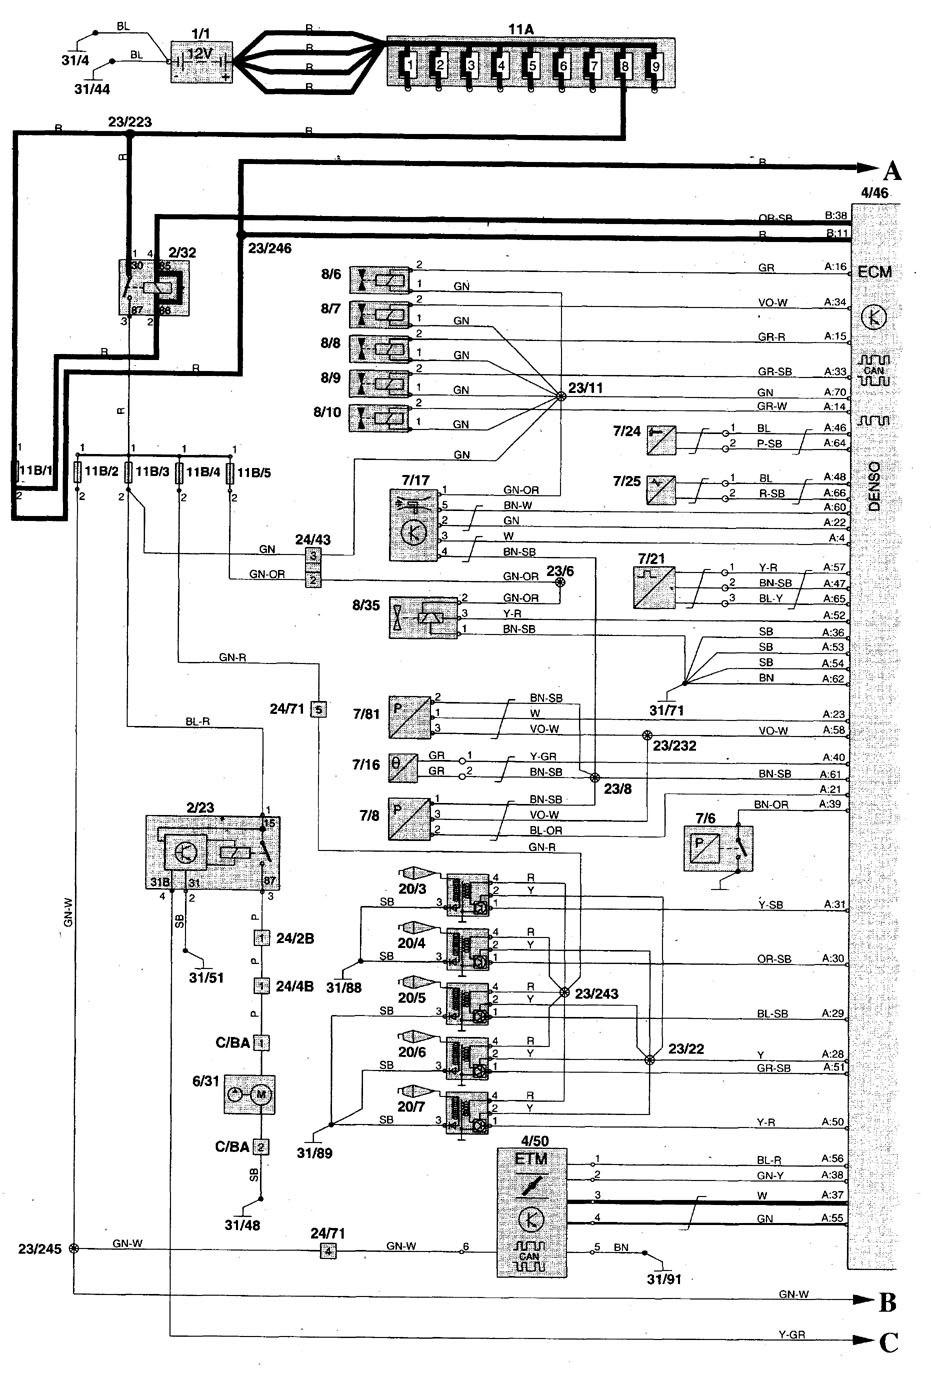 2016 hyundai sonata wiring diagram how a freezer works volvo c70 (1999 - 2004) diagrams fuel pump carknowledge